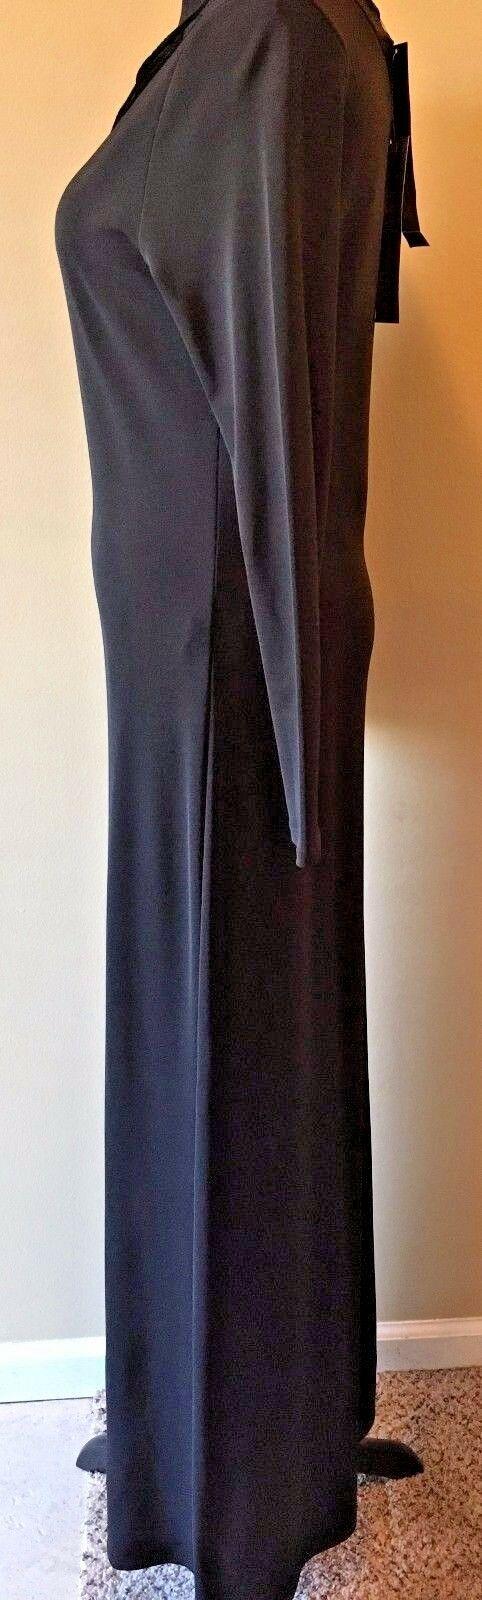 Anne Klein Black Velvet & Rayon Cutout Long Formal Dress size S M NWT $225 DS7 image 4